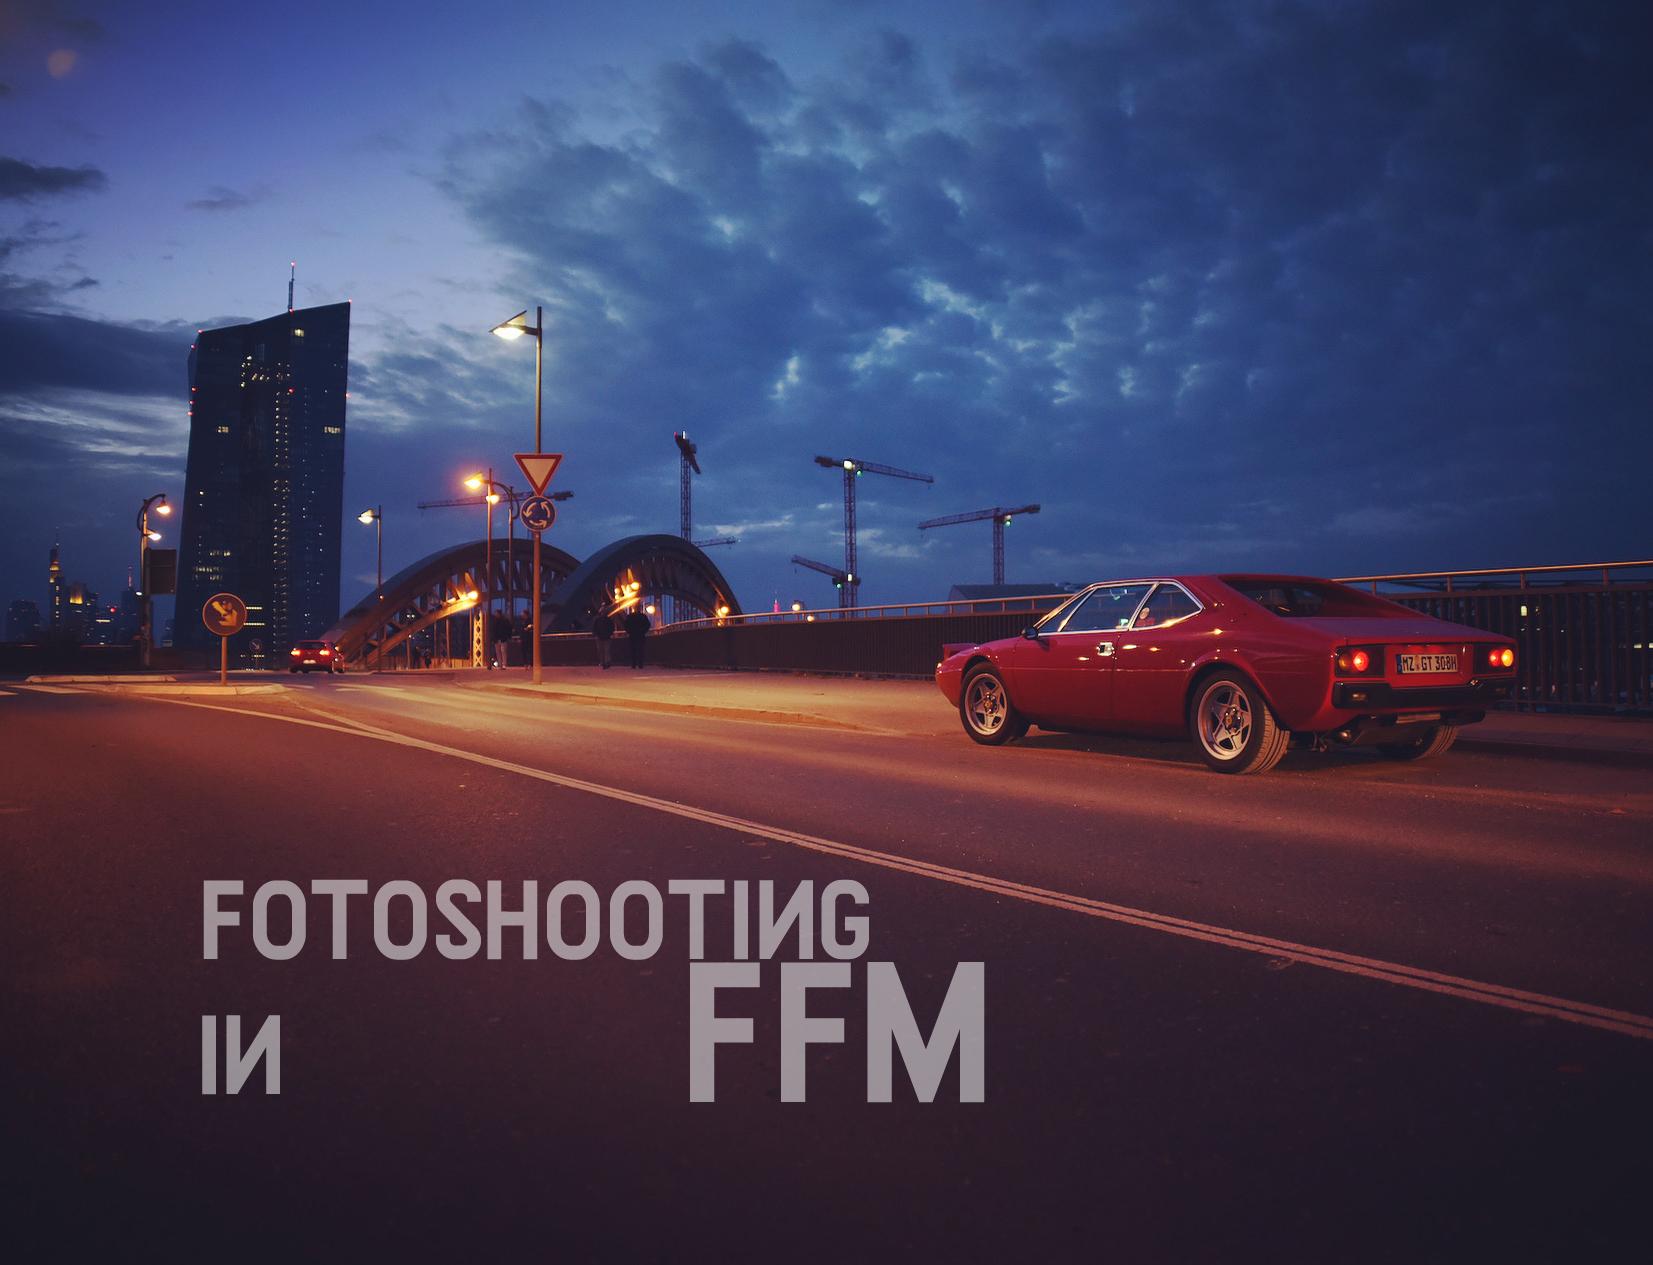 FFM_title2